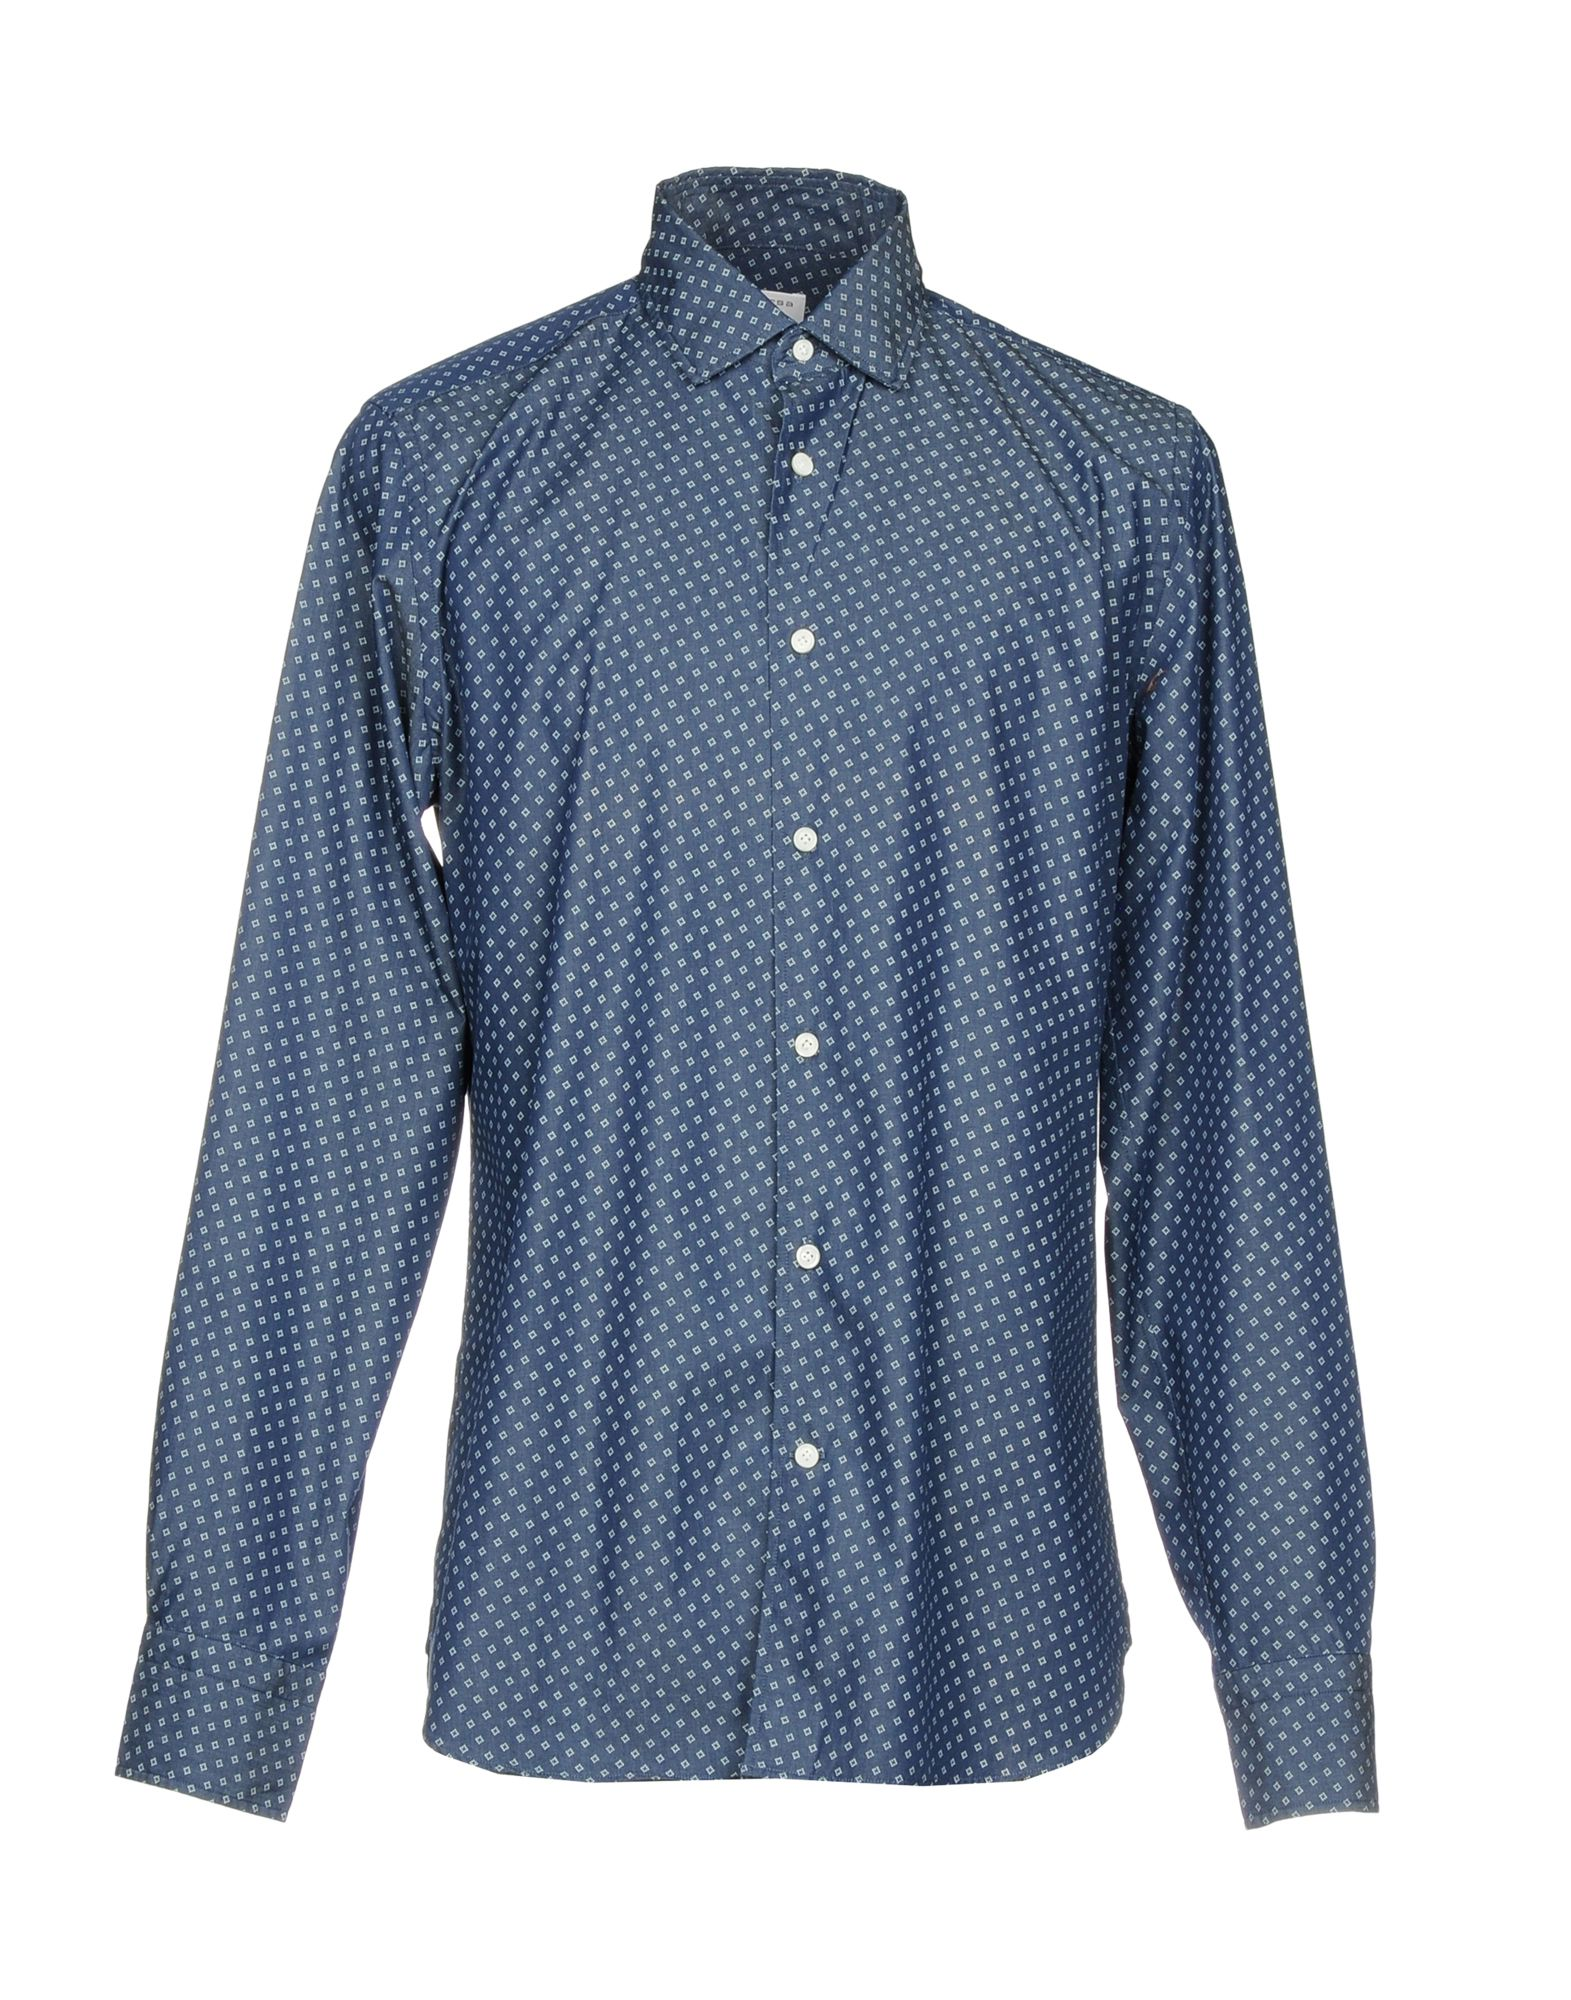 BORSA Джинсовая рубашка рубашка джинсовая 3 12 лет